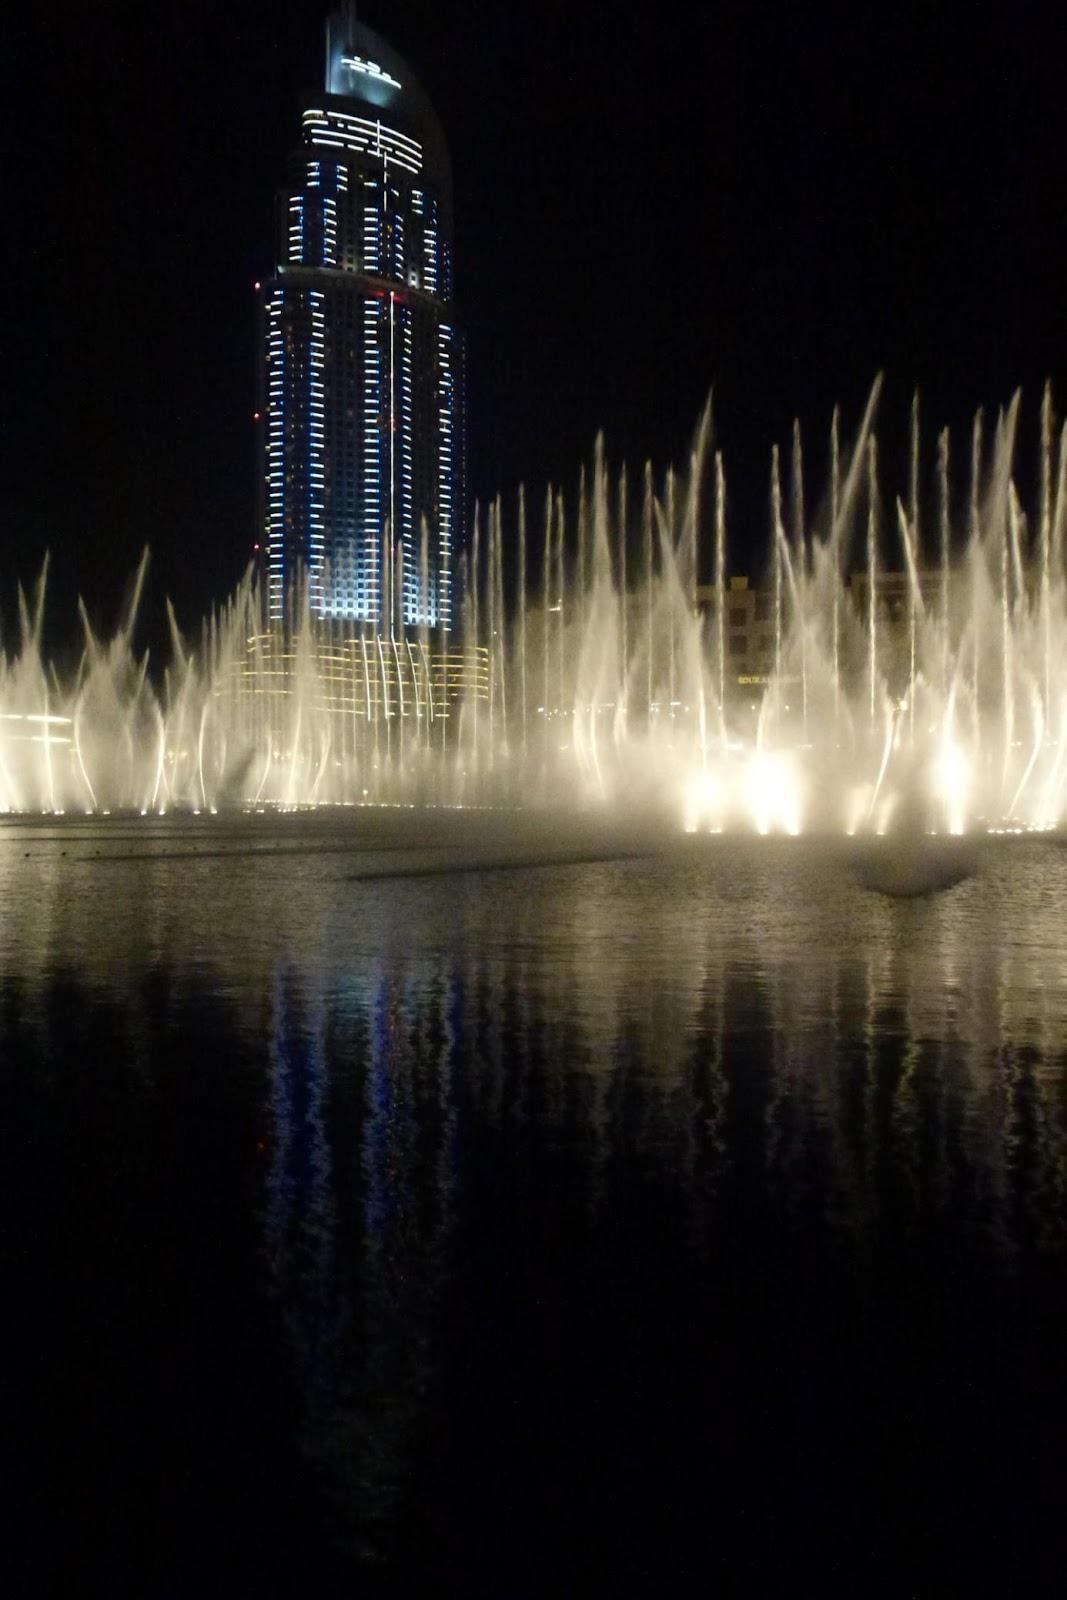 C:\Users\Silla\Pictures\2012-06-25\Dubai december 2012\P1000543.JPG